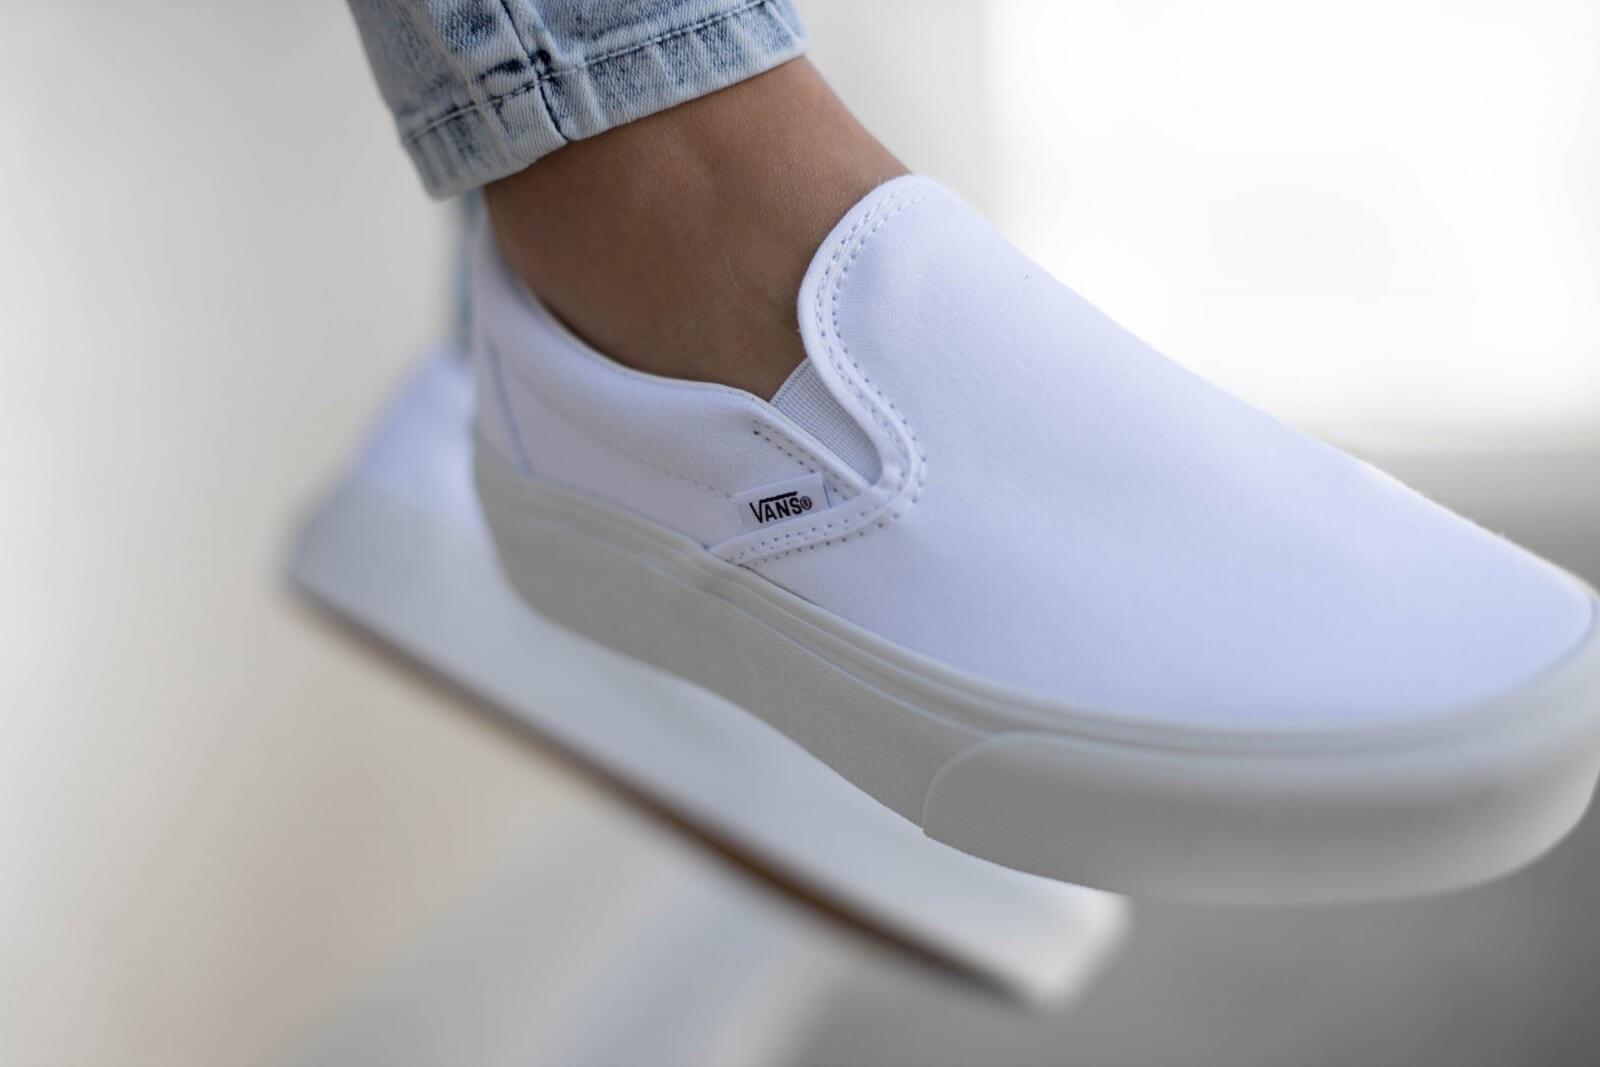 Vans Slip-On Platform True White